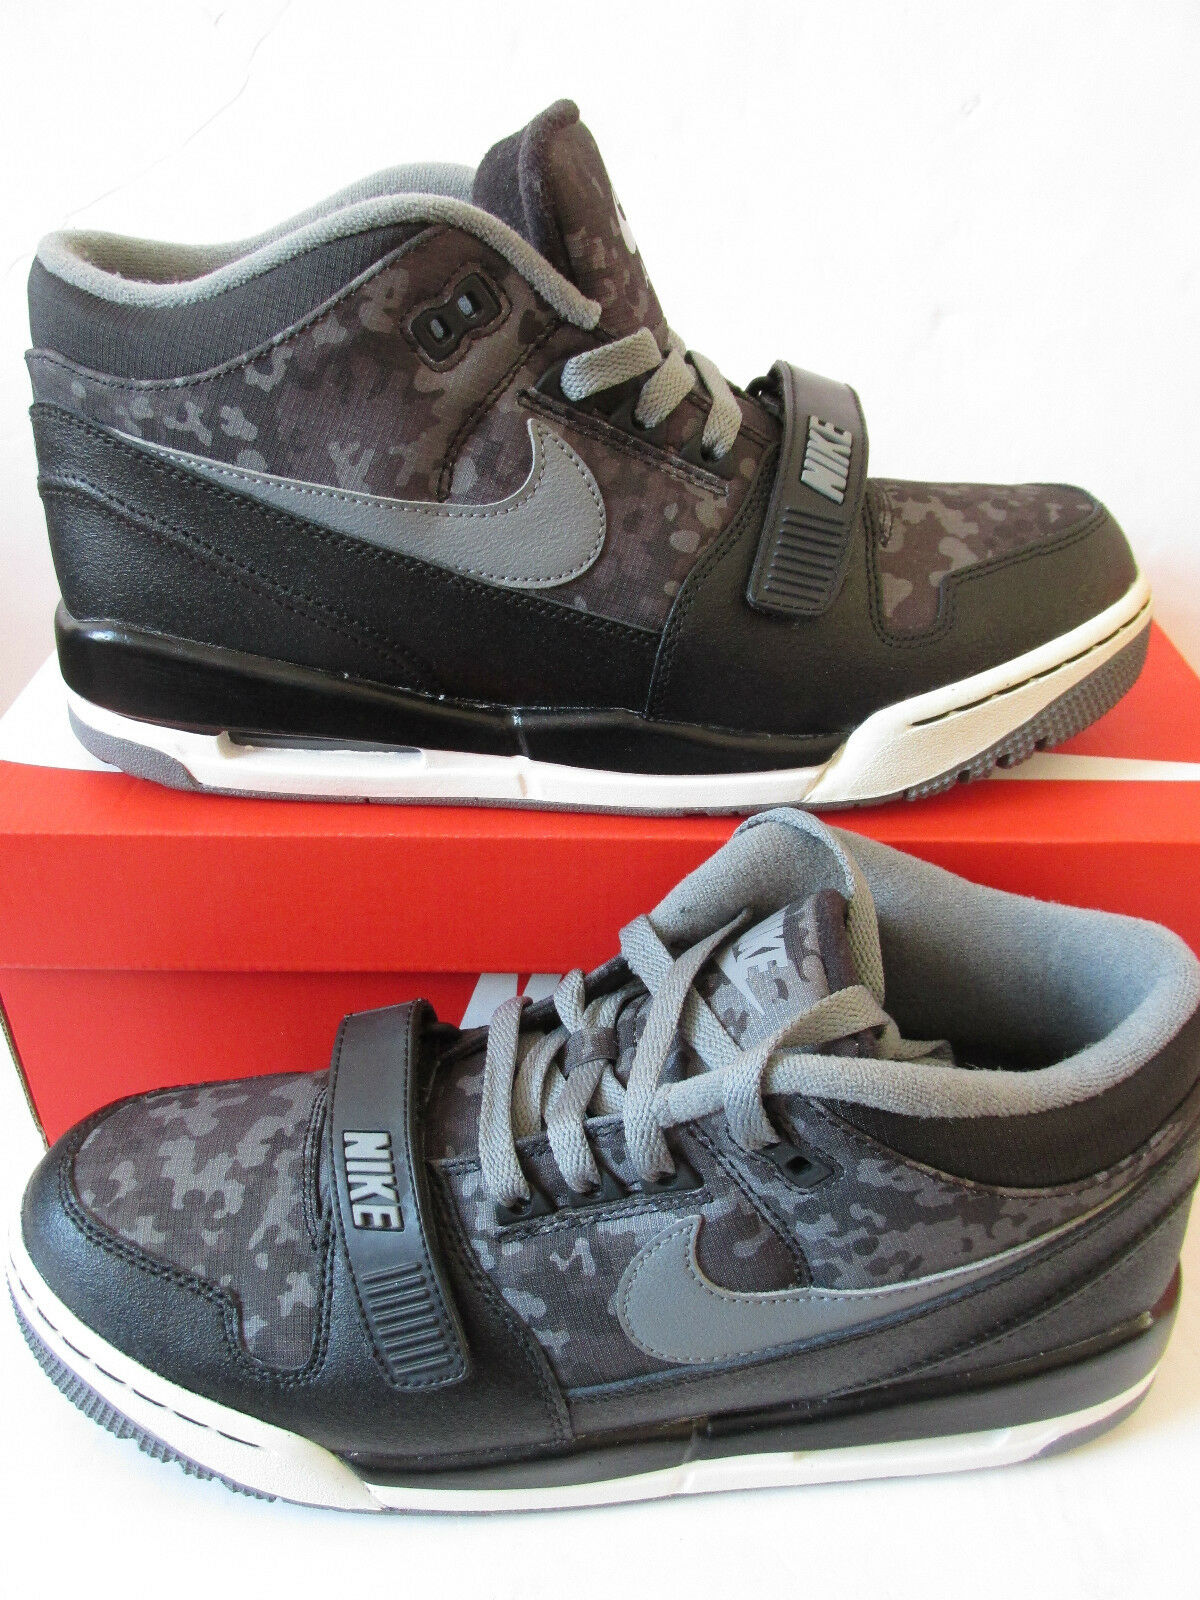 Nike Luft Alphalution Prm 001  Uomo Hallo Turnschuhe 708478 001 Prm Turnschuhe 0873dd